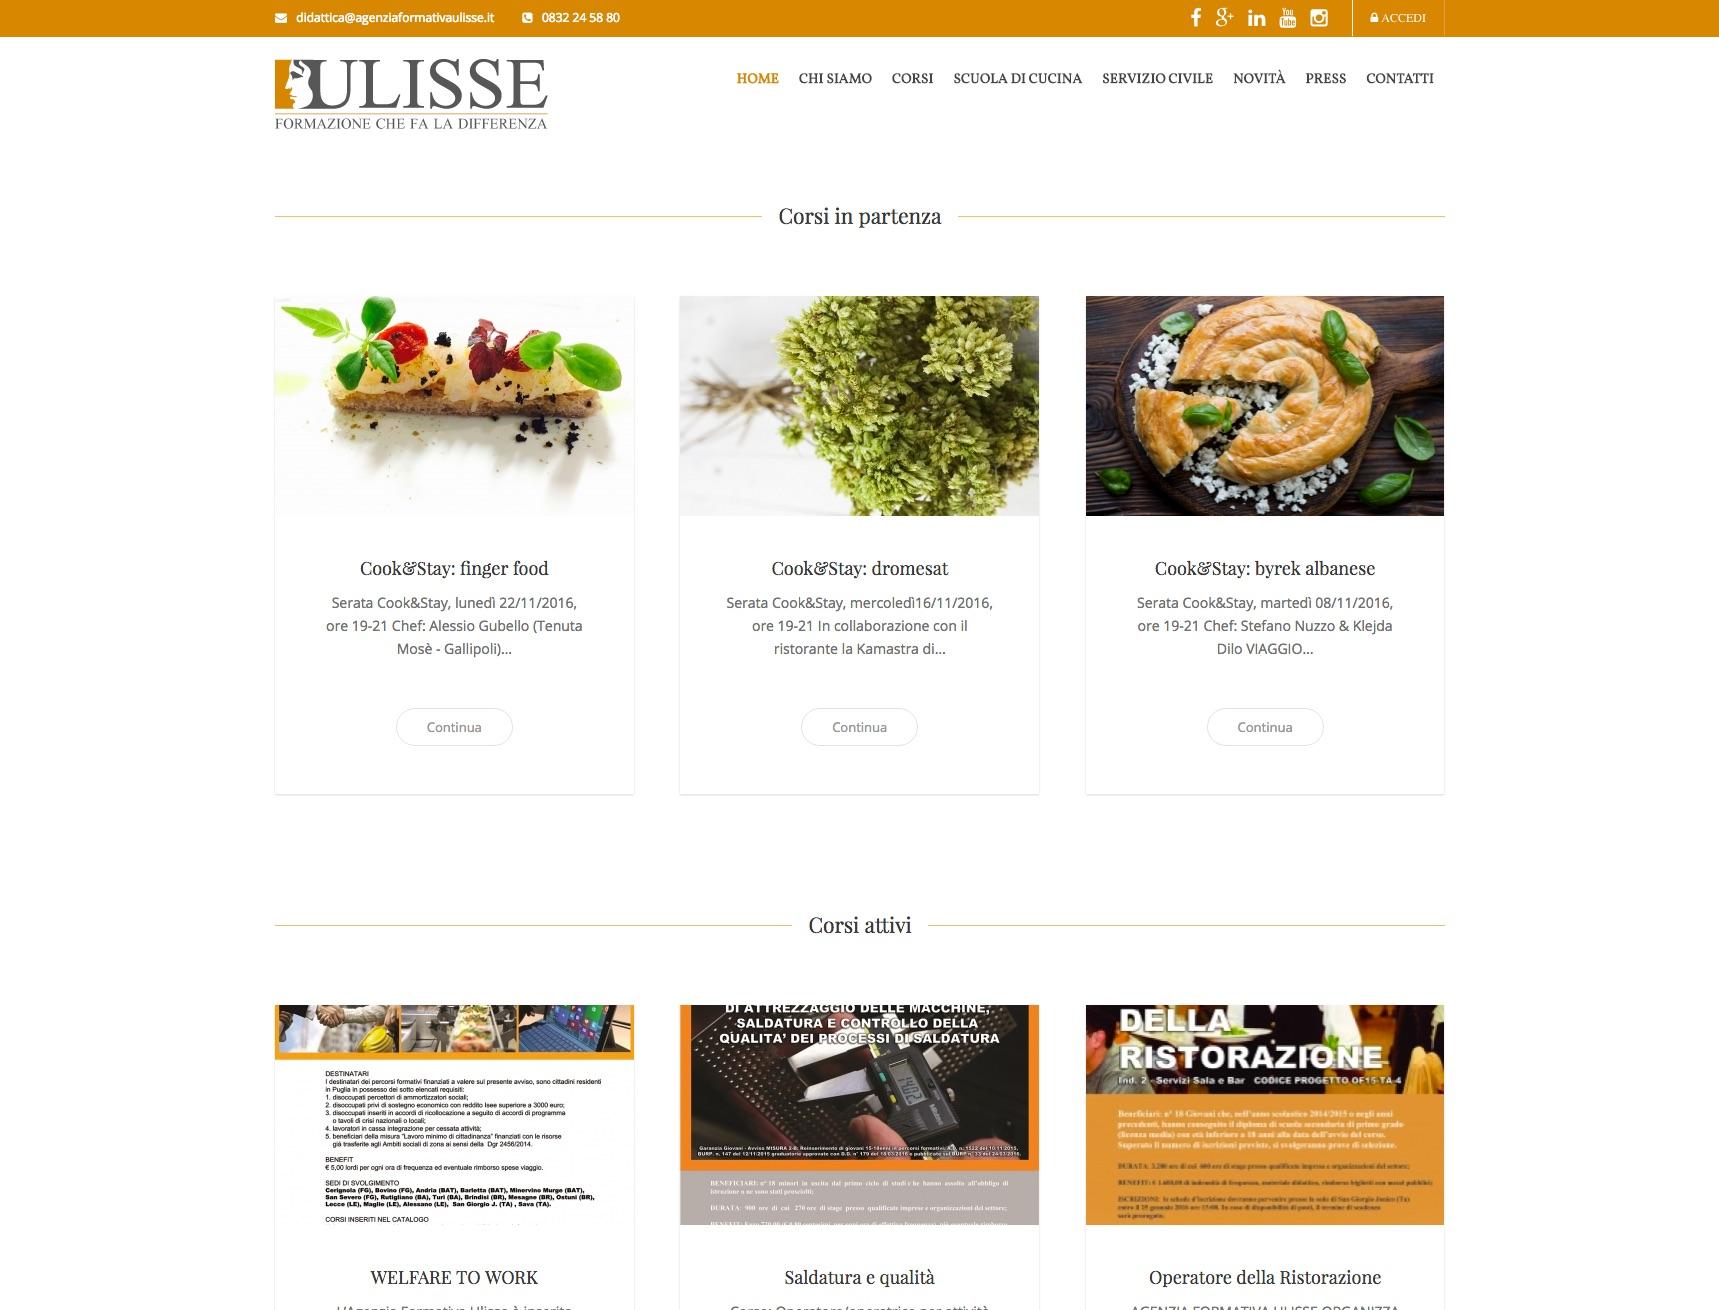 ulisse_01